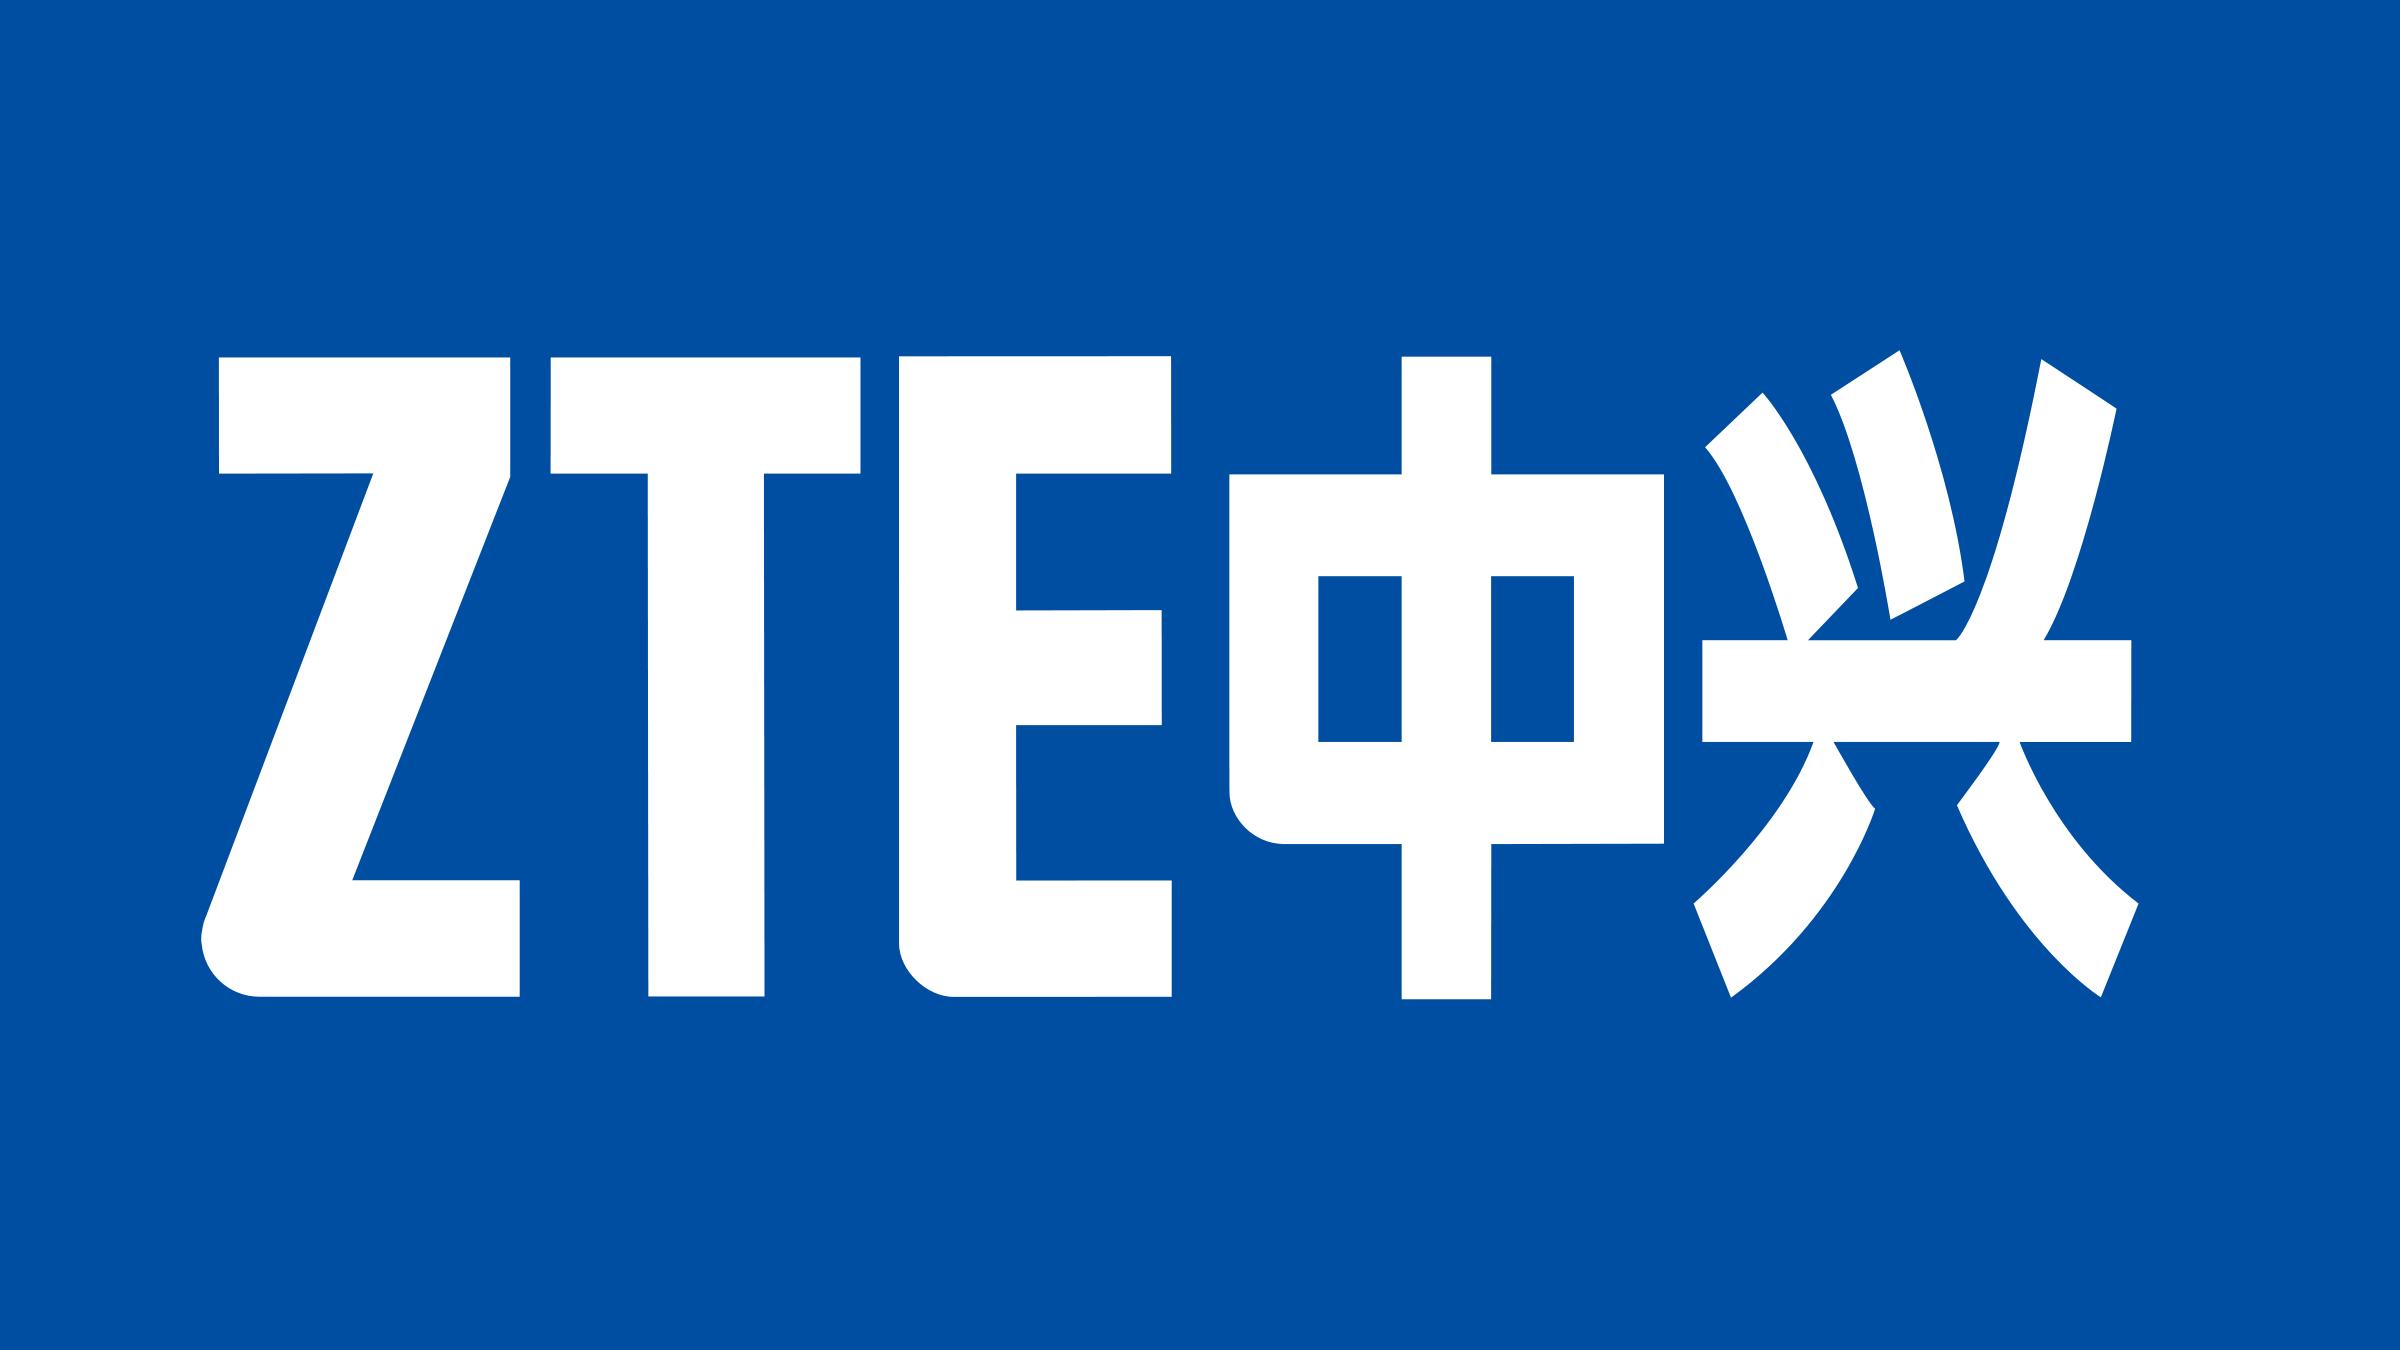 zte mobile logo (f-stop